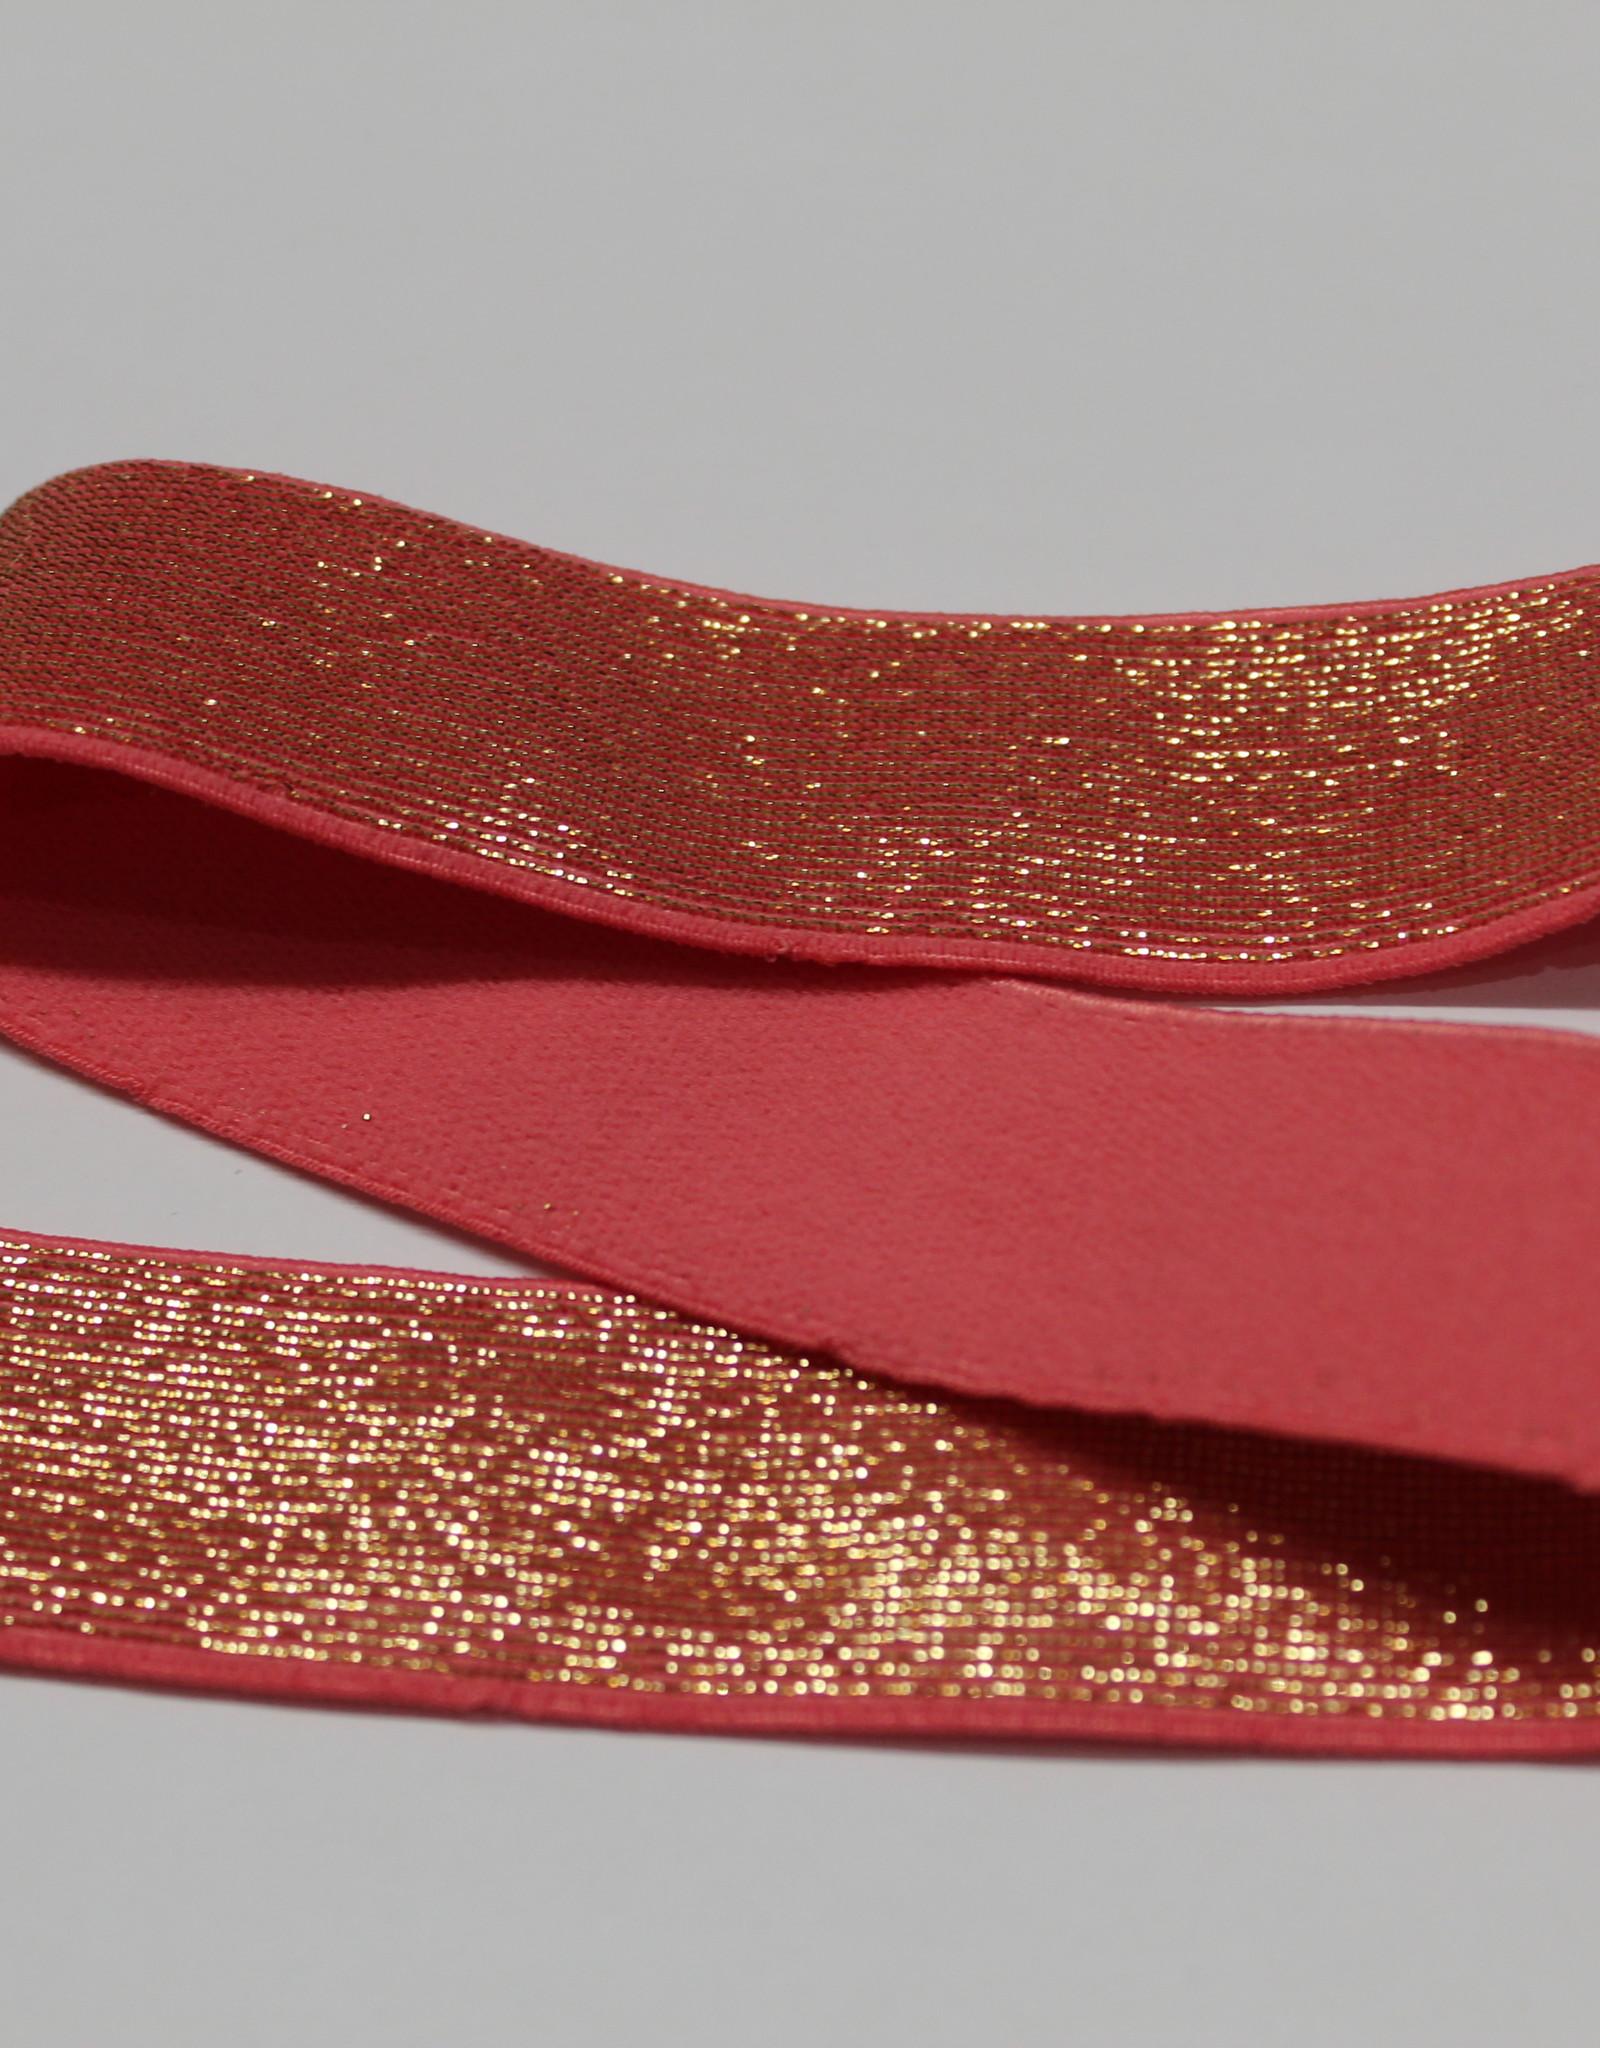 Elastiek roos gouden glitter 25mm